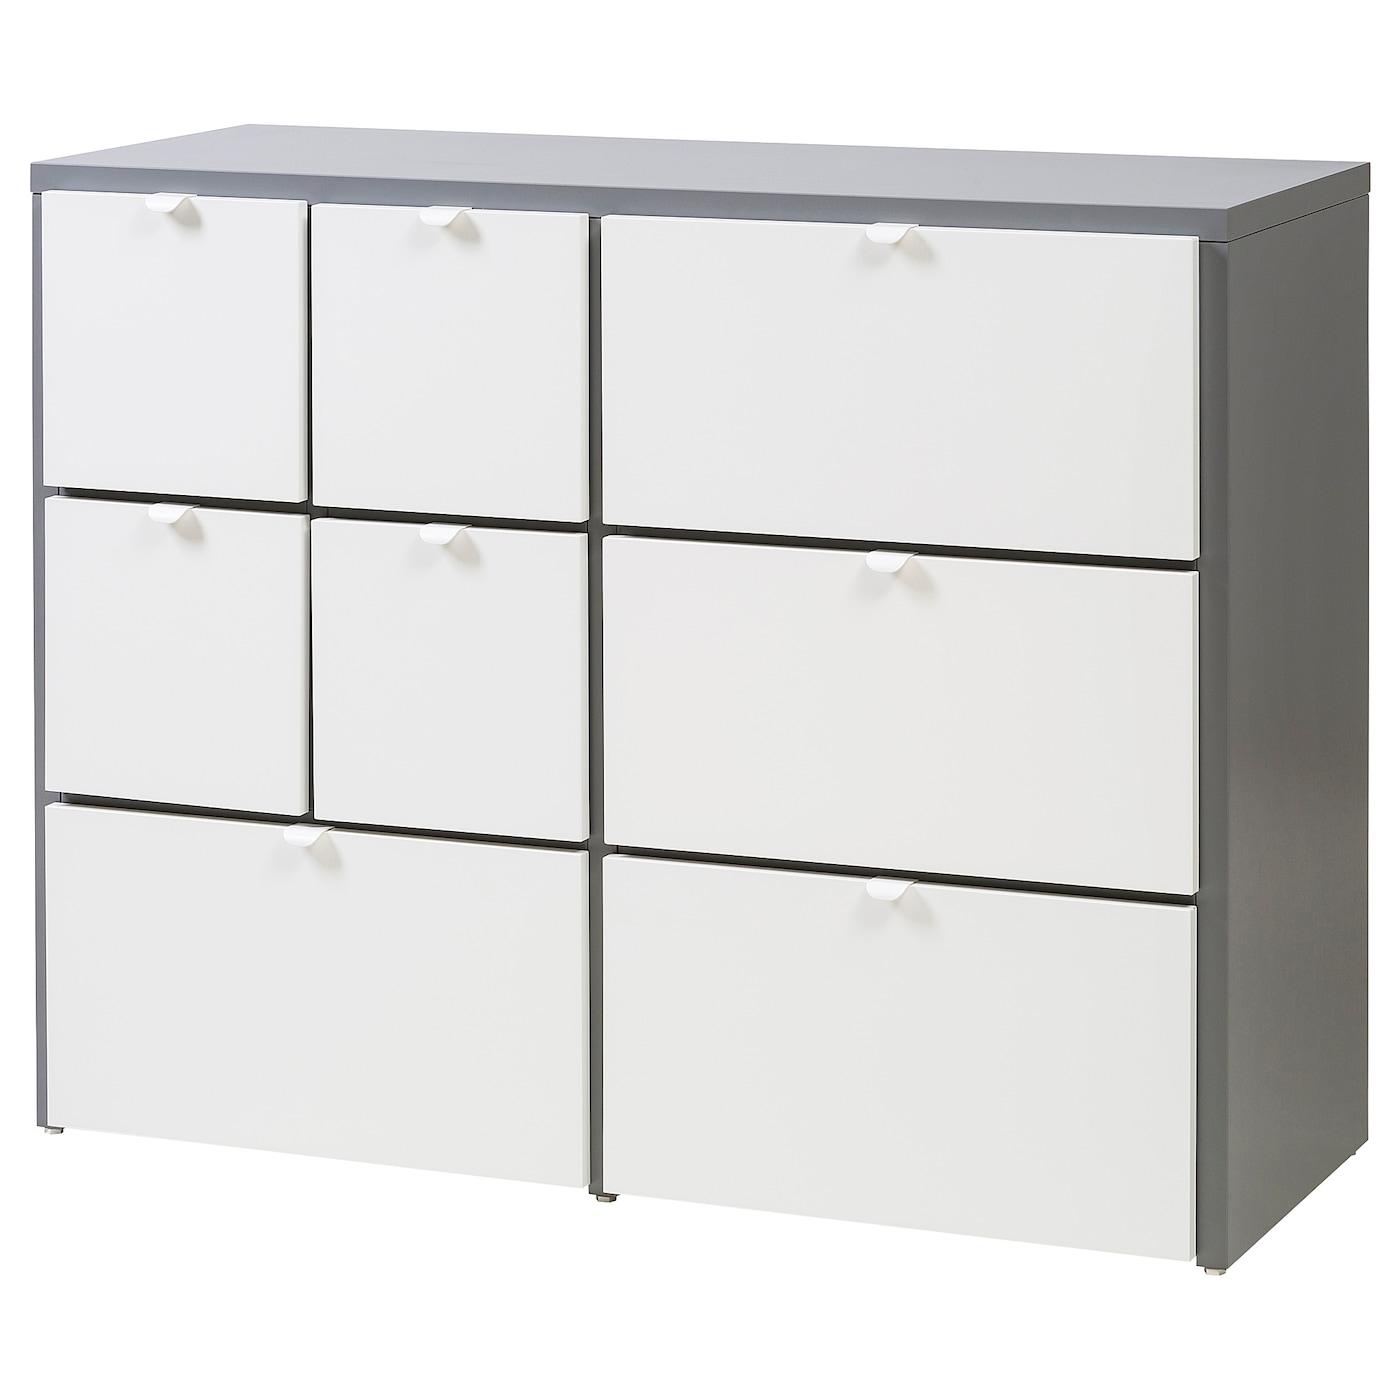 visthus commode 8 tiroirs gris blanc 122x96 cm ikea. Black Bedroom Furniture Sets. Home Design Ideas